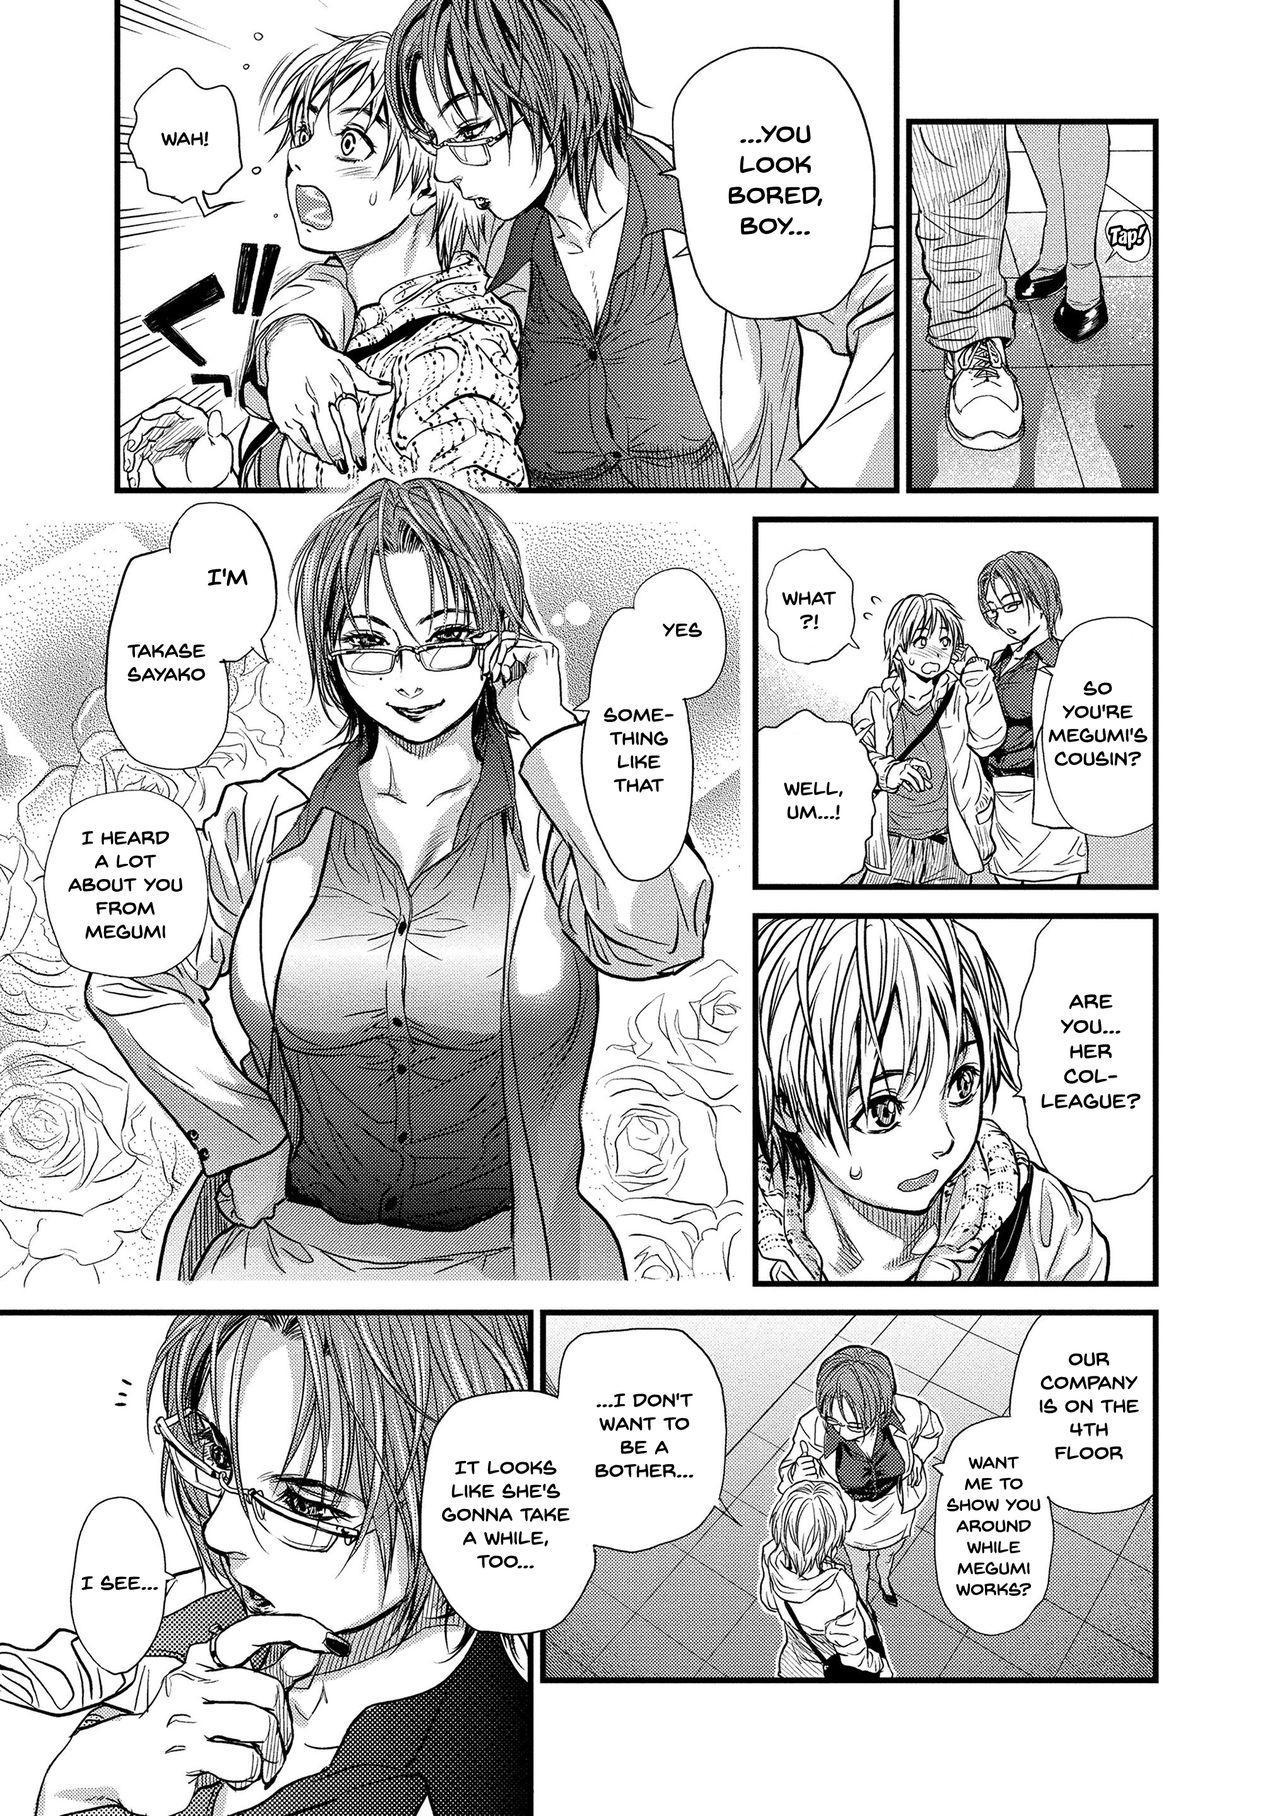 [Kenji Kishizuka] Boku to Itoko no Onee-san to   Together With My Older Cousin Ch.1-3 [English] {Doujins.com} [Digital] 23